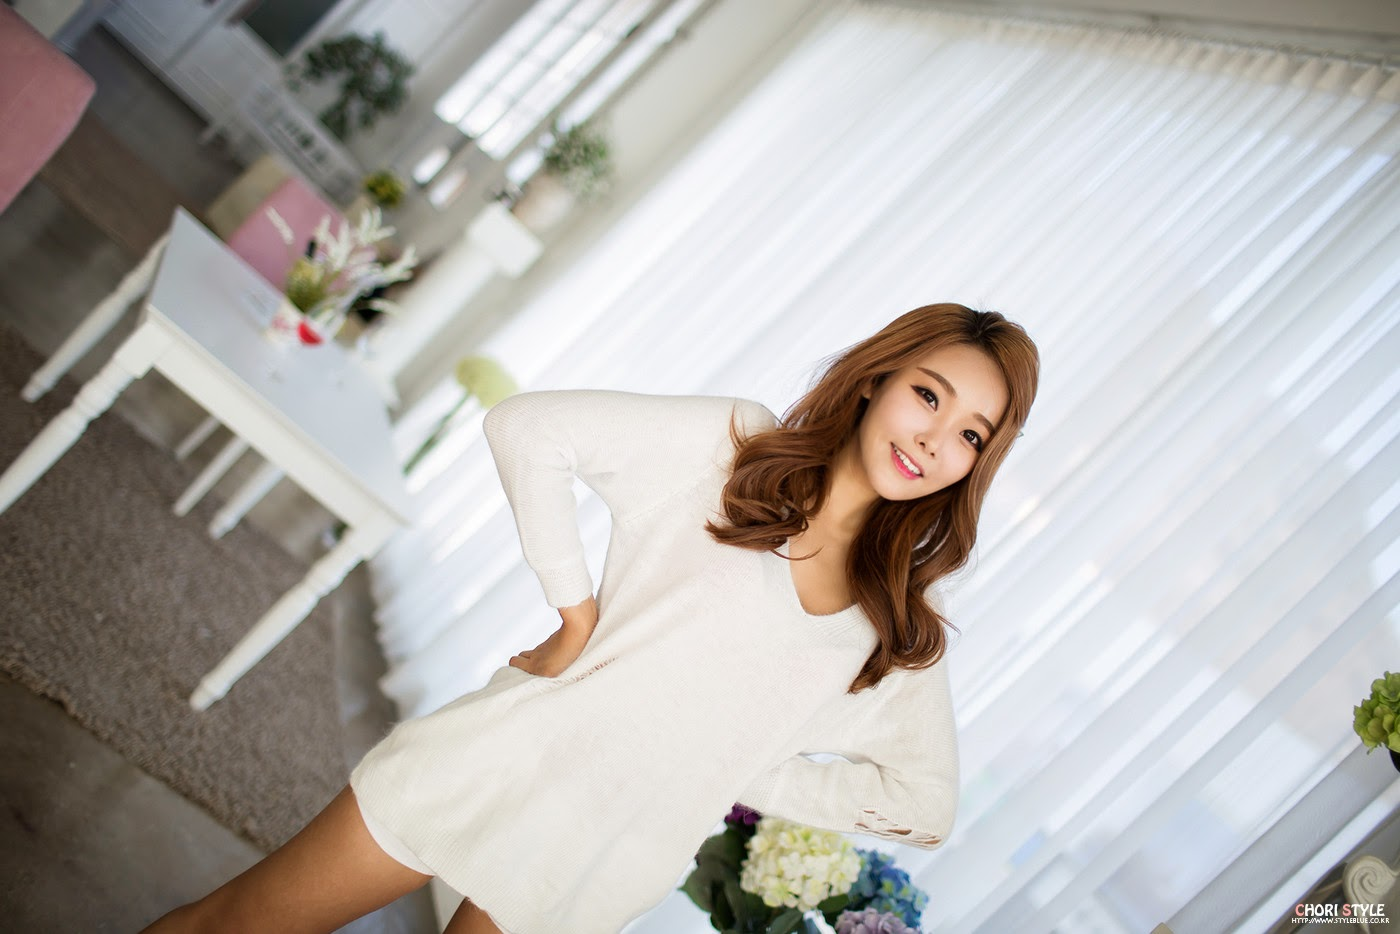 4 Lee Da Hee - Morning - very cute asian girl-girlcute4u.blogspot.com